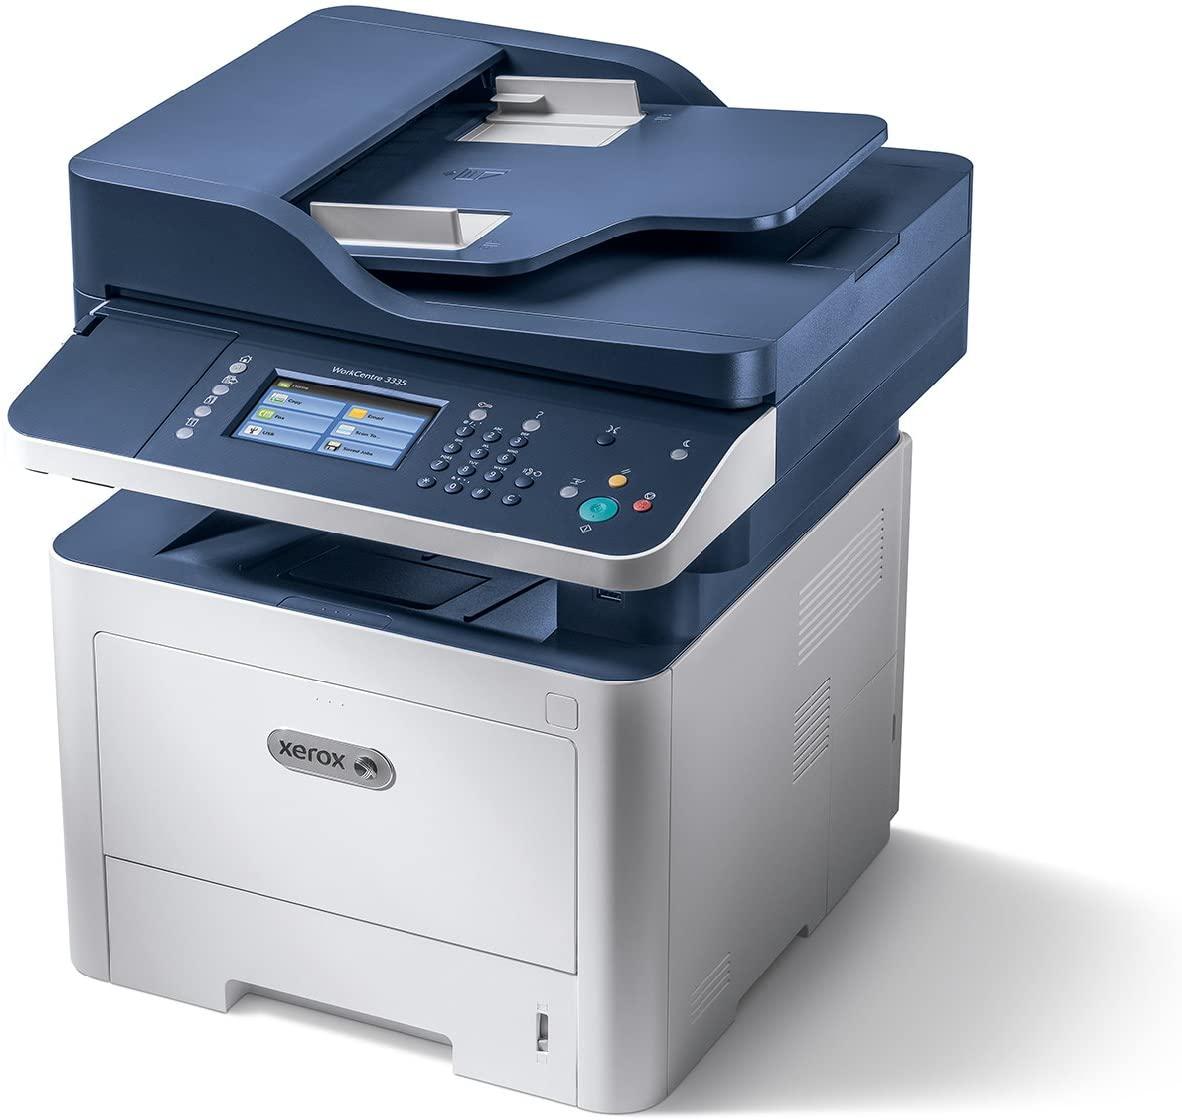 Xerox WorkCentre 3335 DNI Monochrome Multifunction Printer